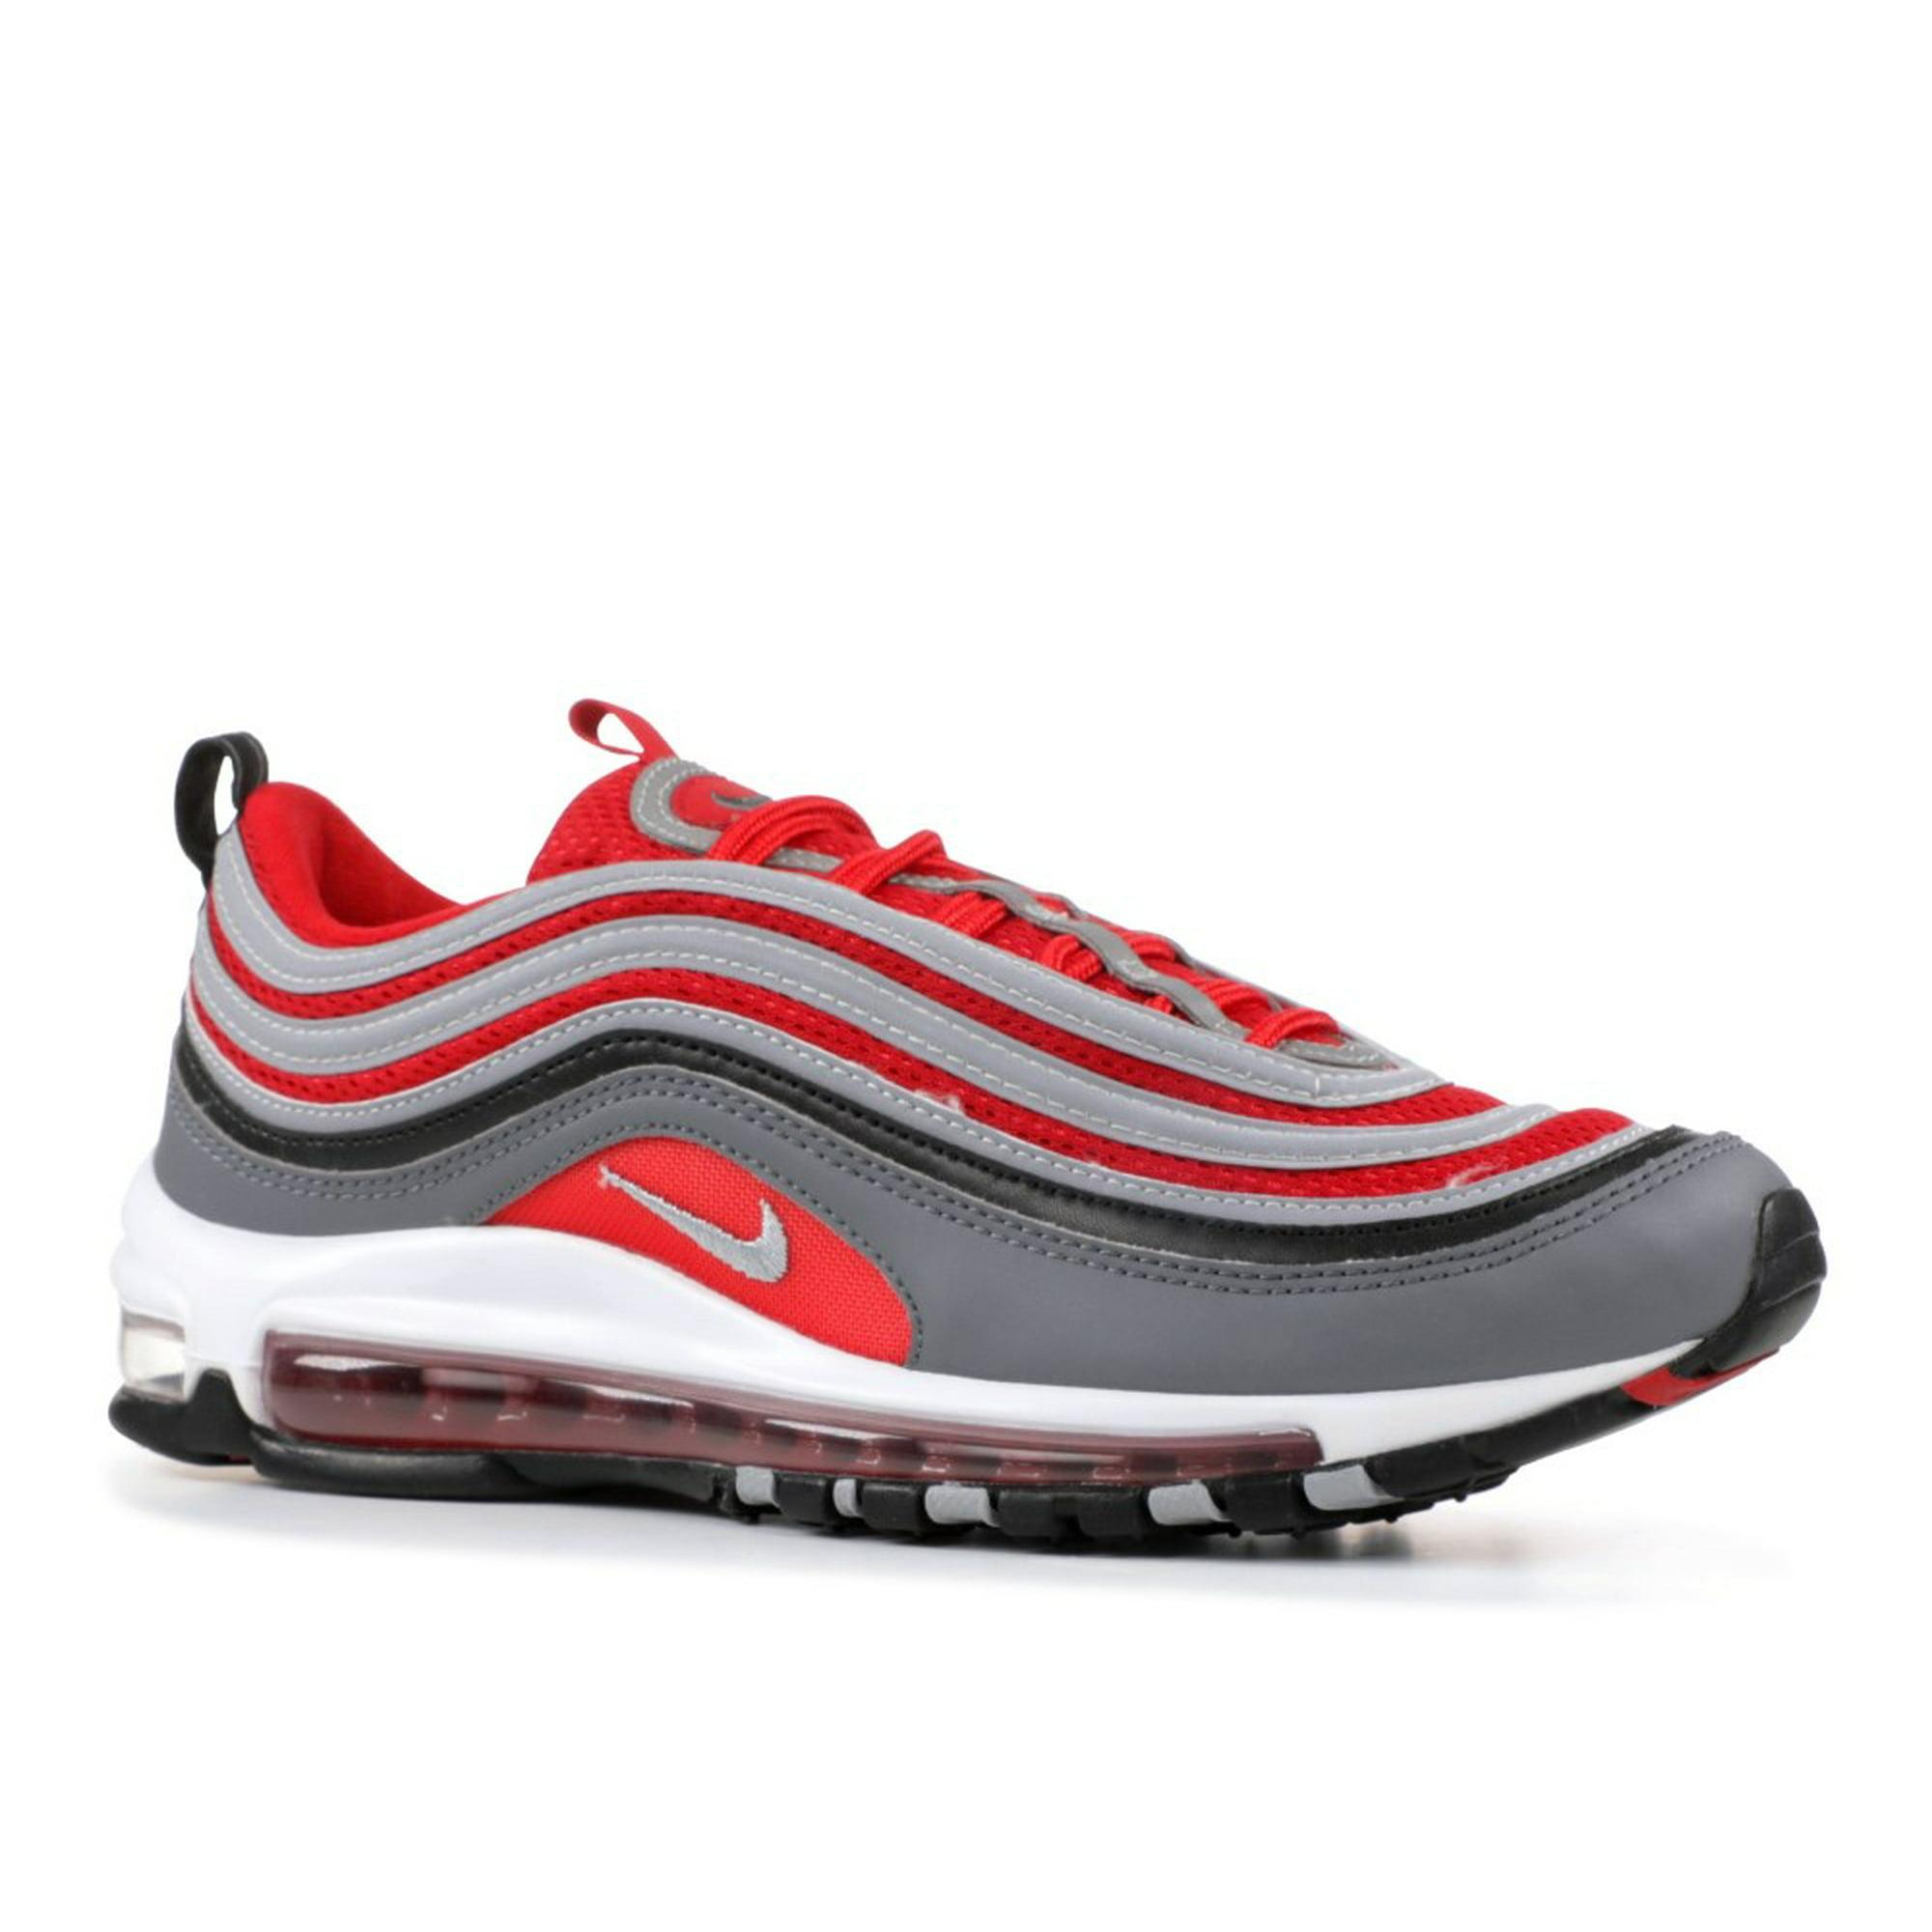 Nike Men Nike Air Max 97 921826 007 Size 13